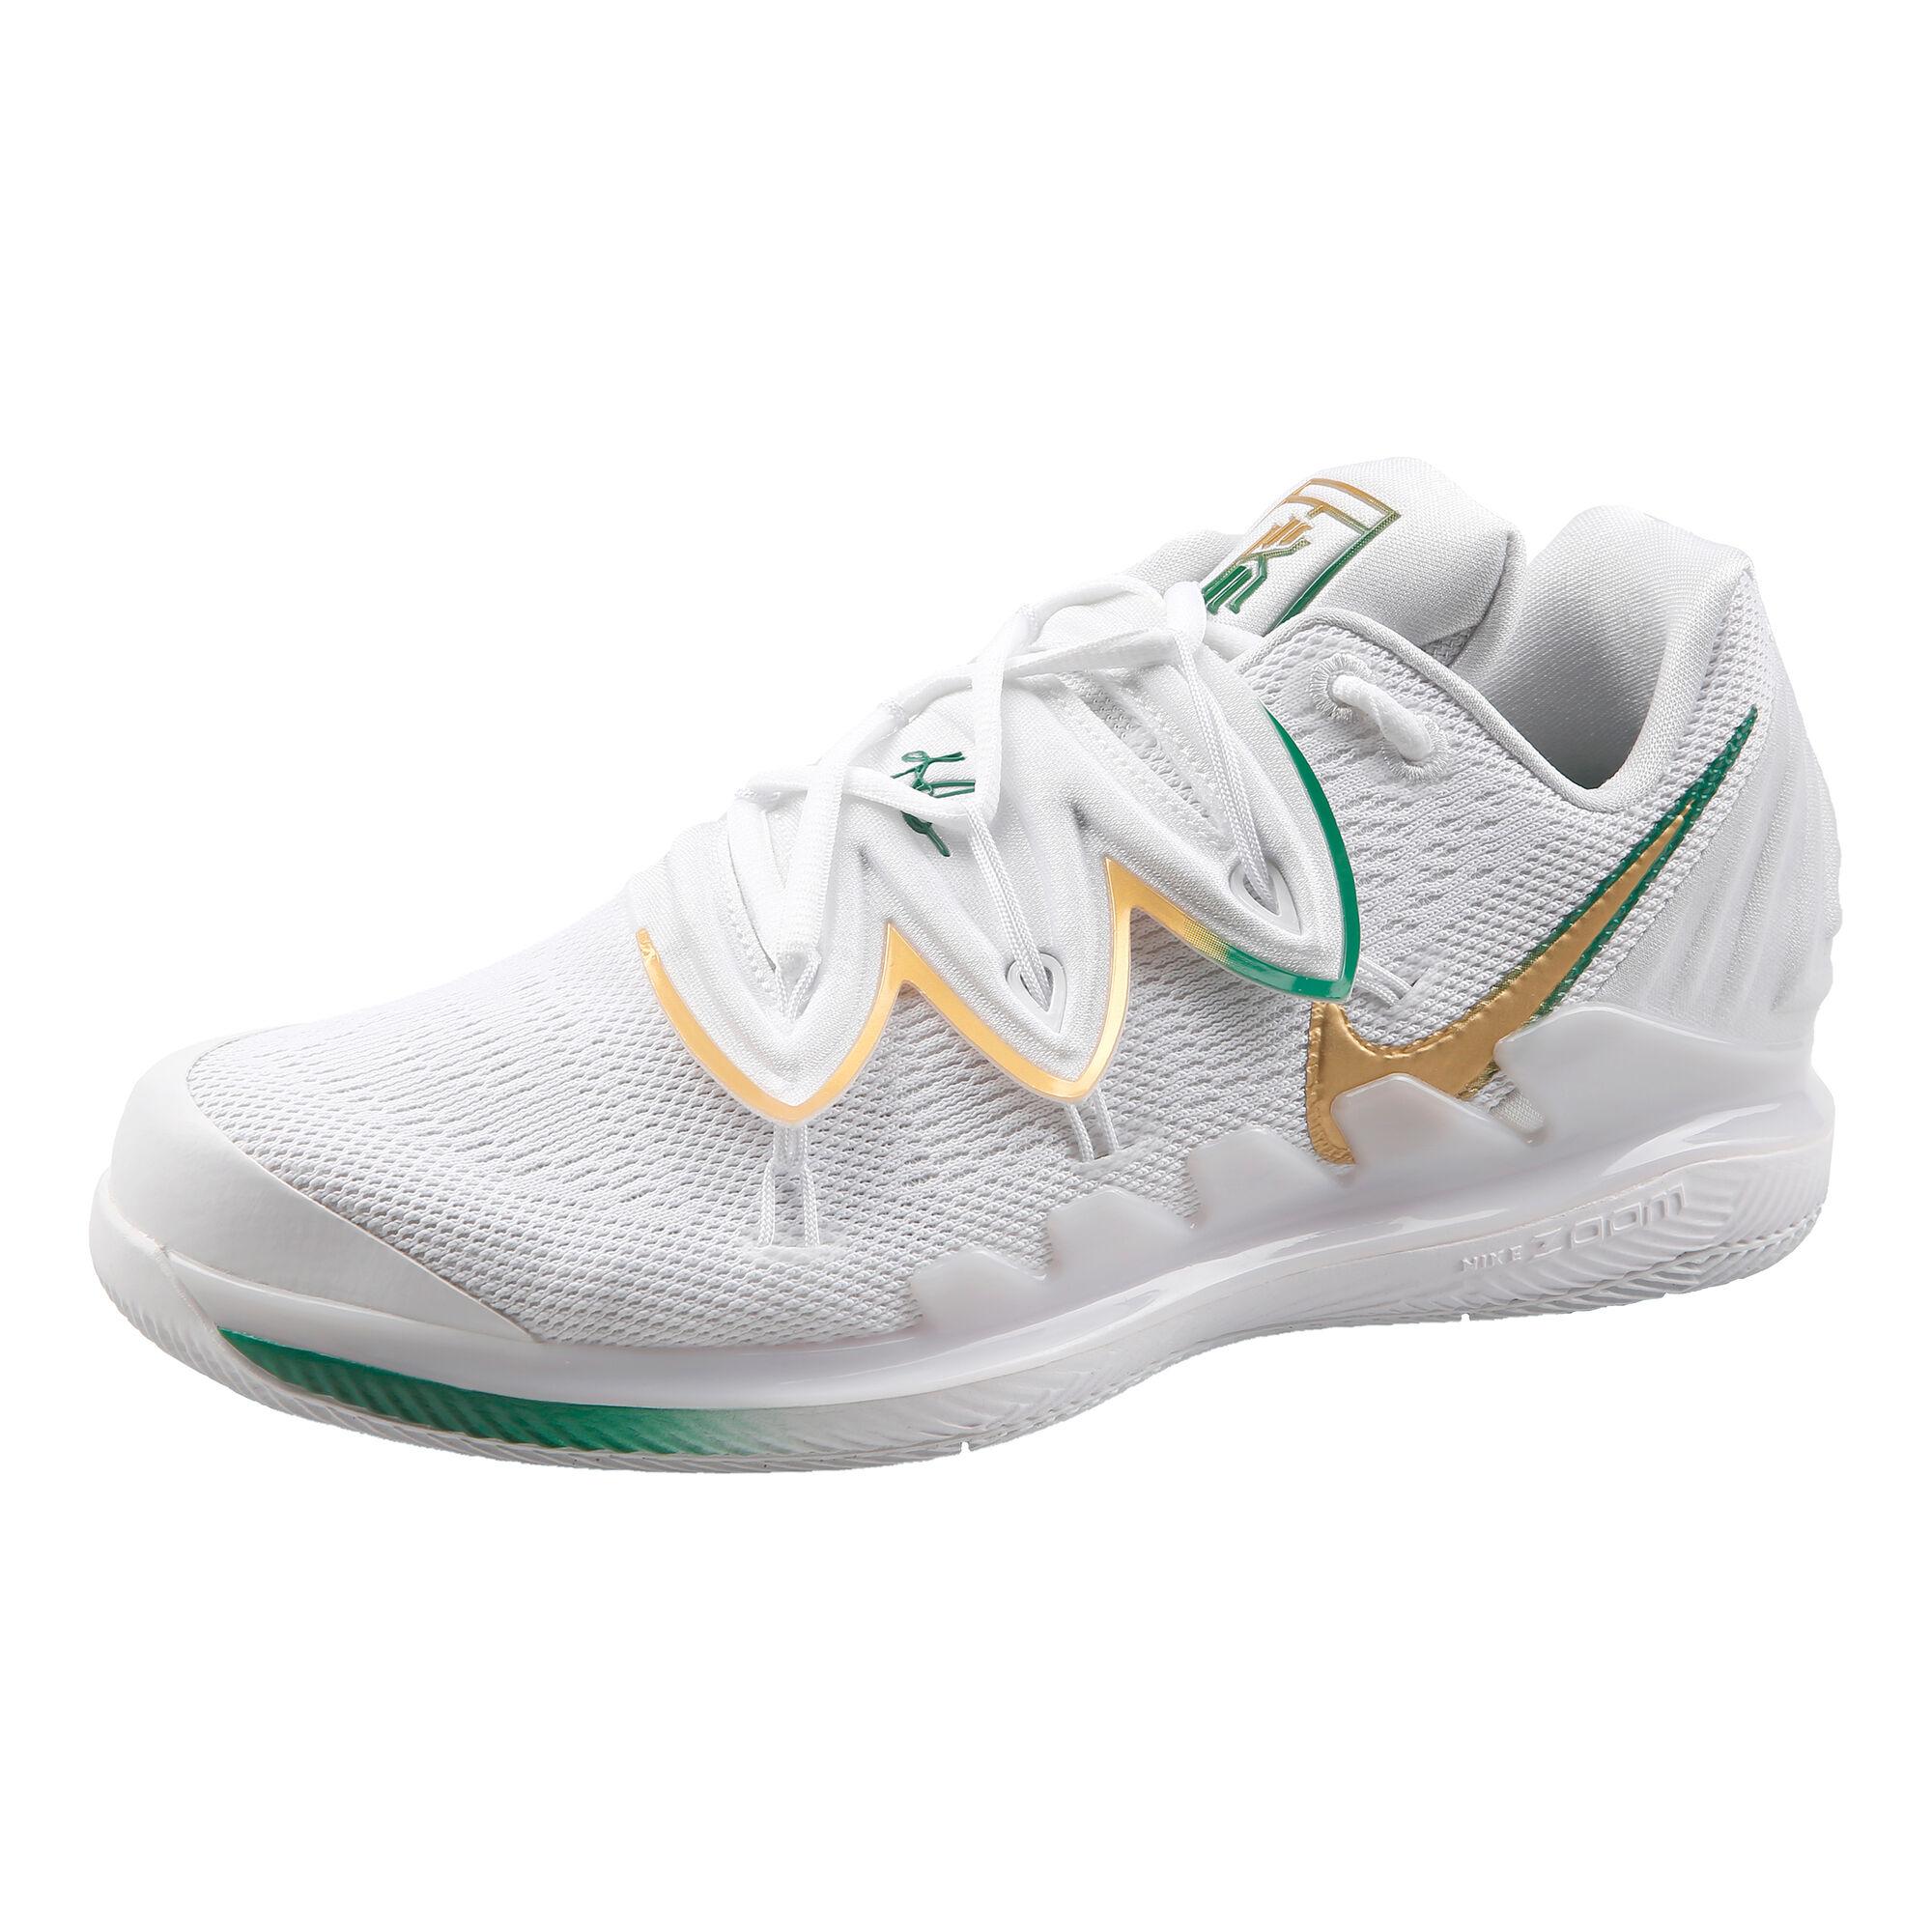 e2907e3fcbda Nike; Nike; Nike; Nike; Nike; Nike; Nike; Nike; Nike; Nike; Nike. Air Zoom  Vapor X Kyrie ...